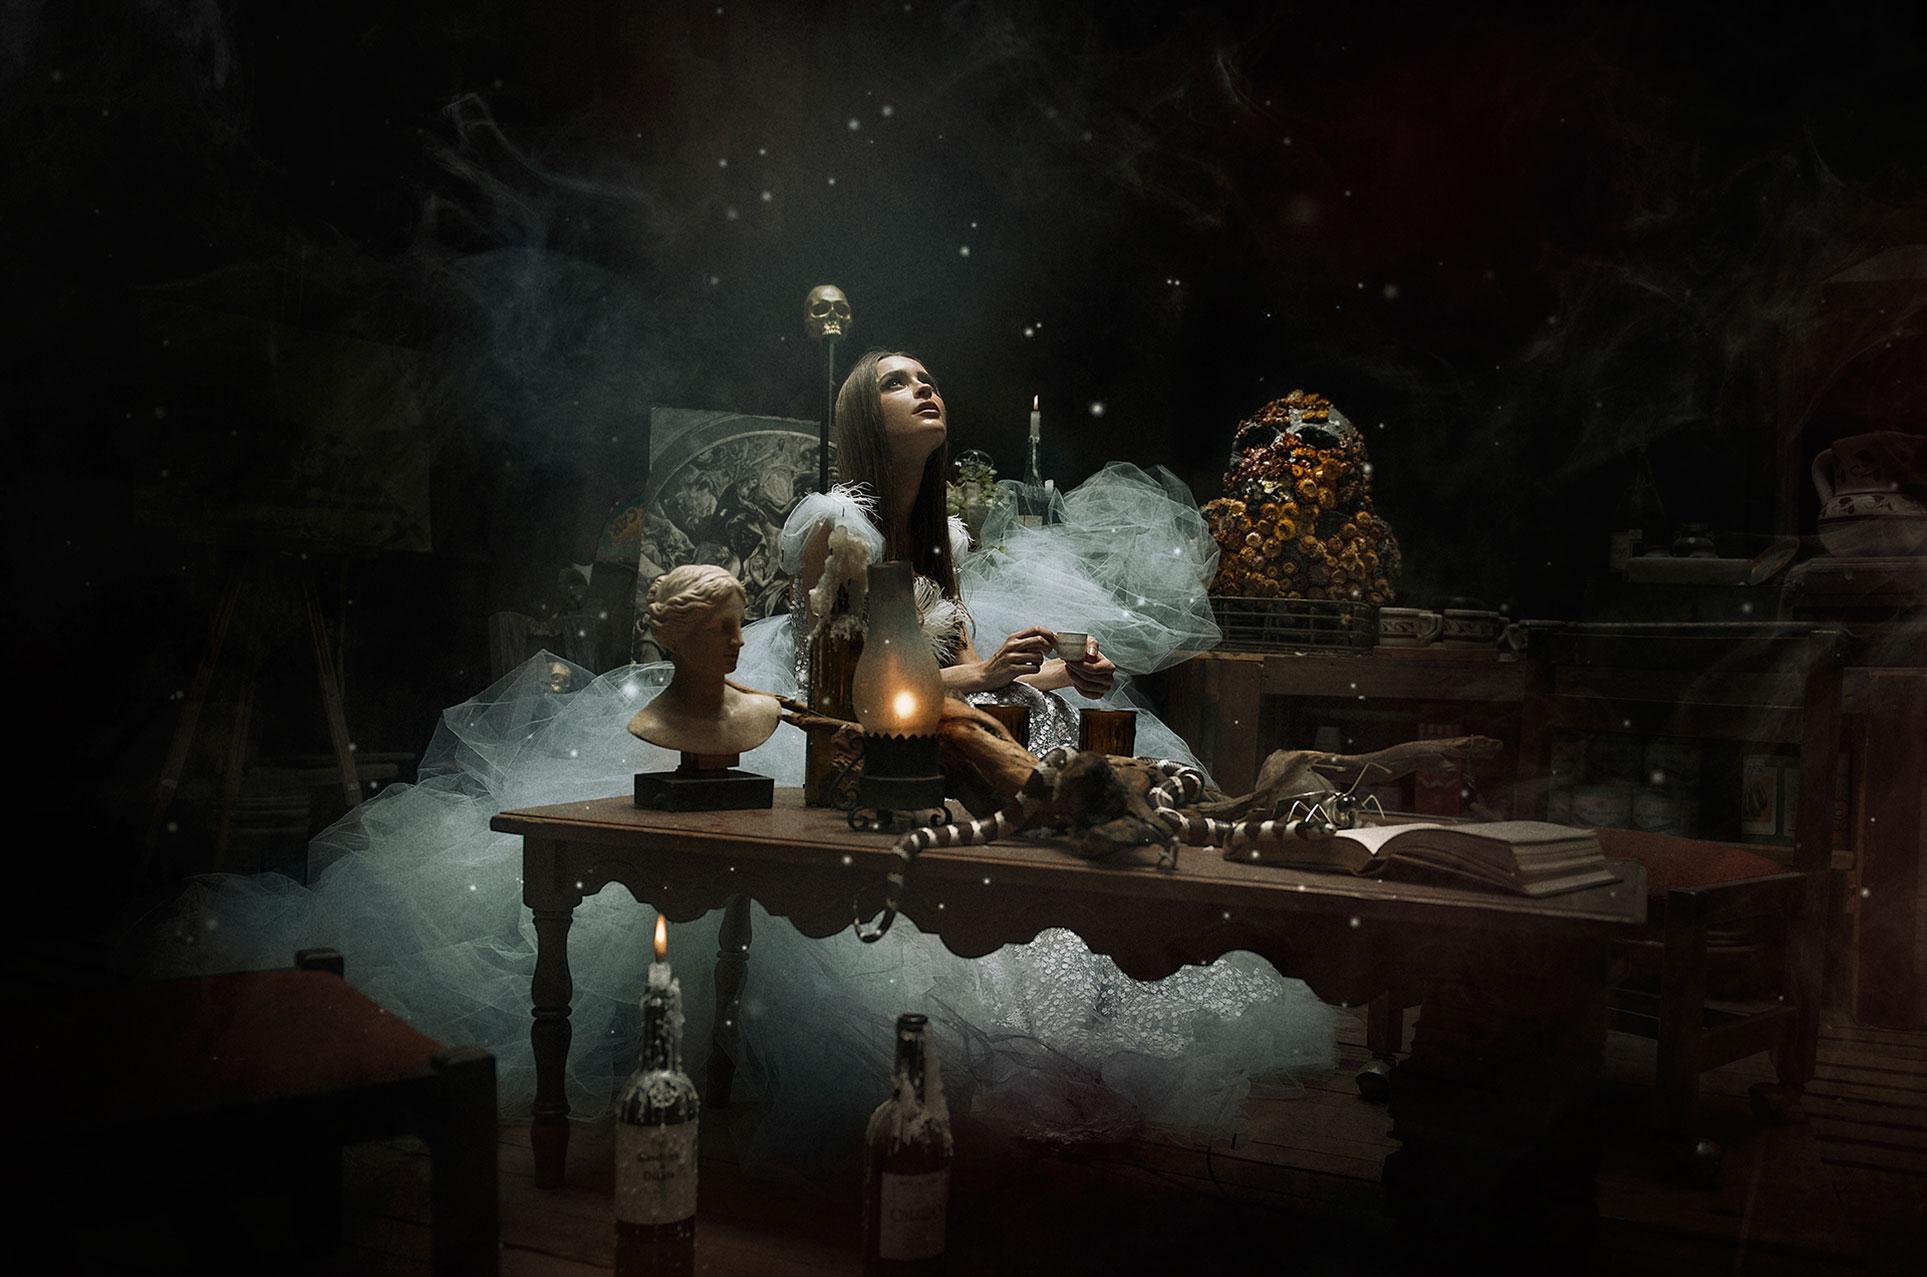 Haunting Memories / Dasha Eremenok by Jvdas Berra